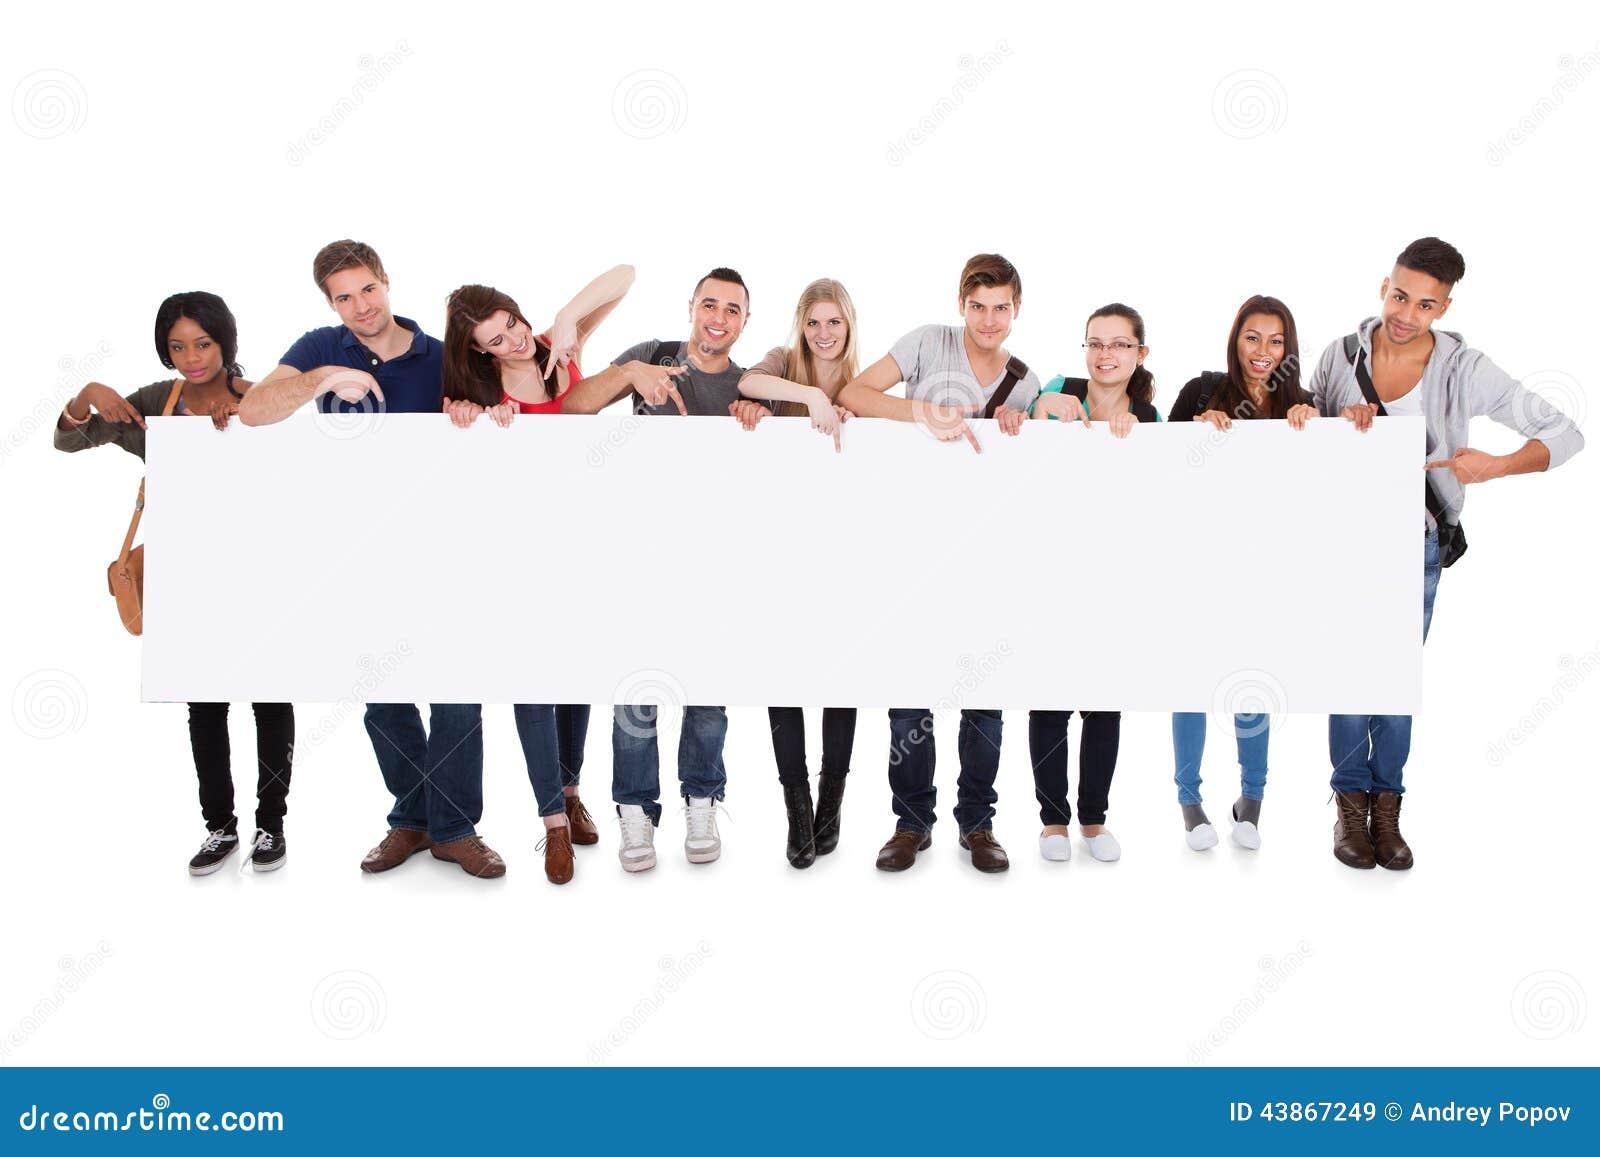 College students displaying blank billboard